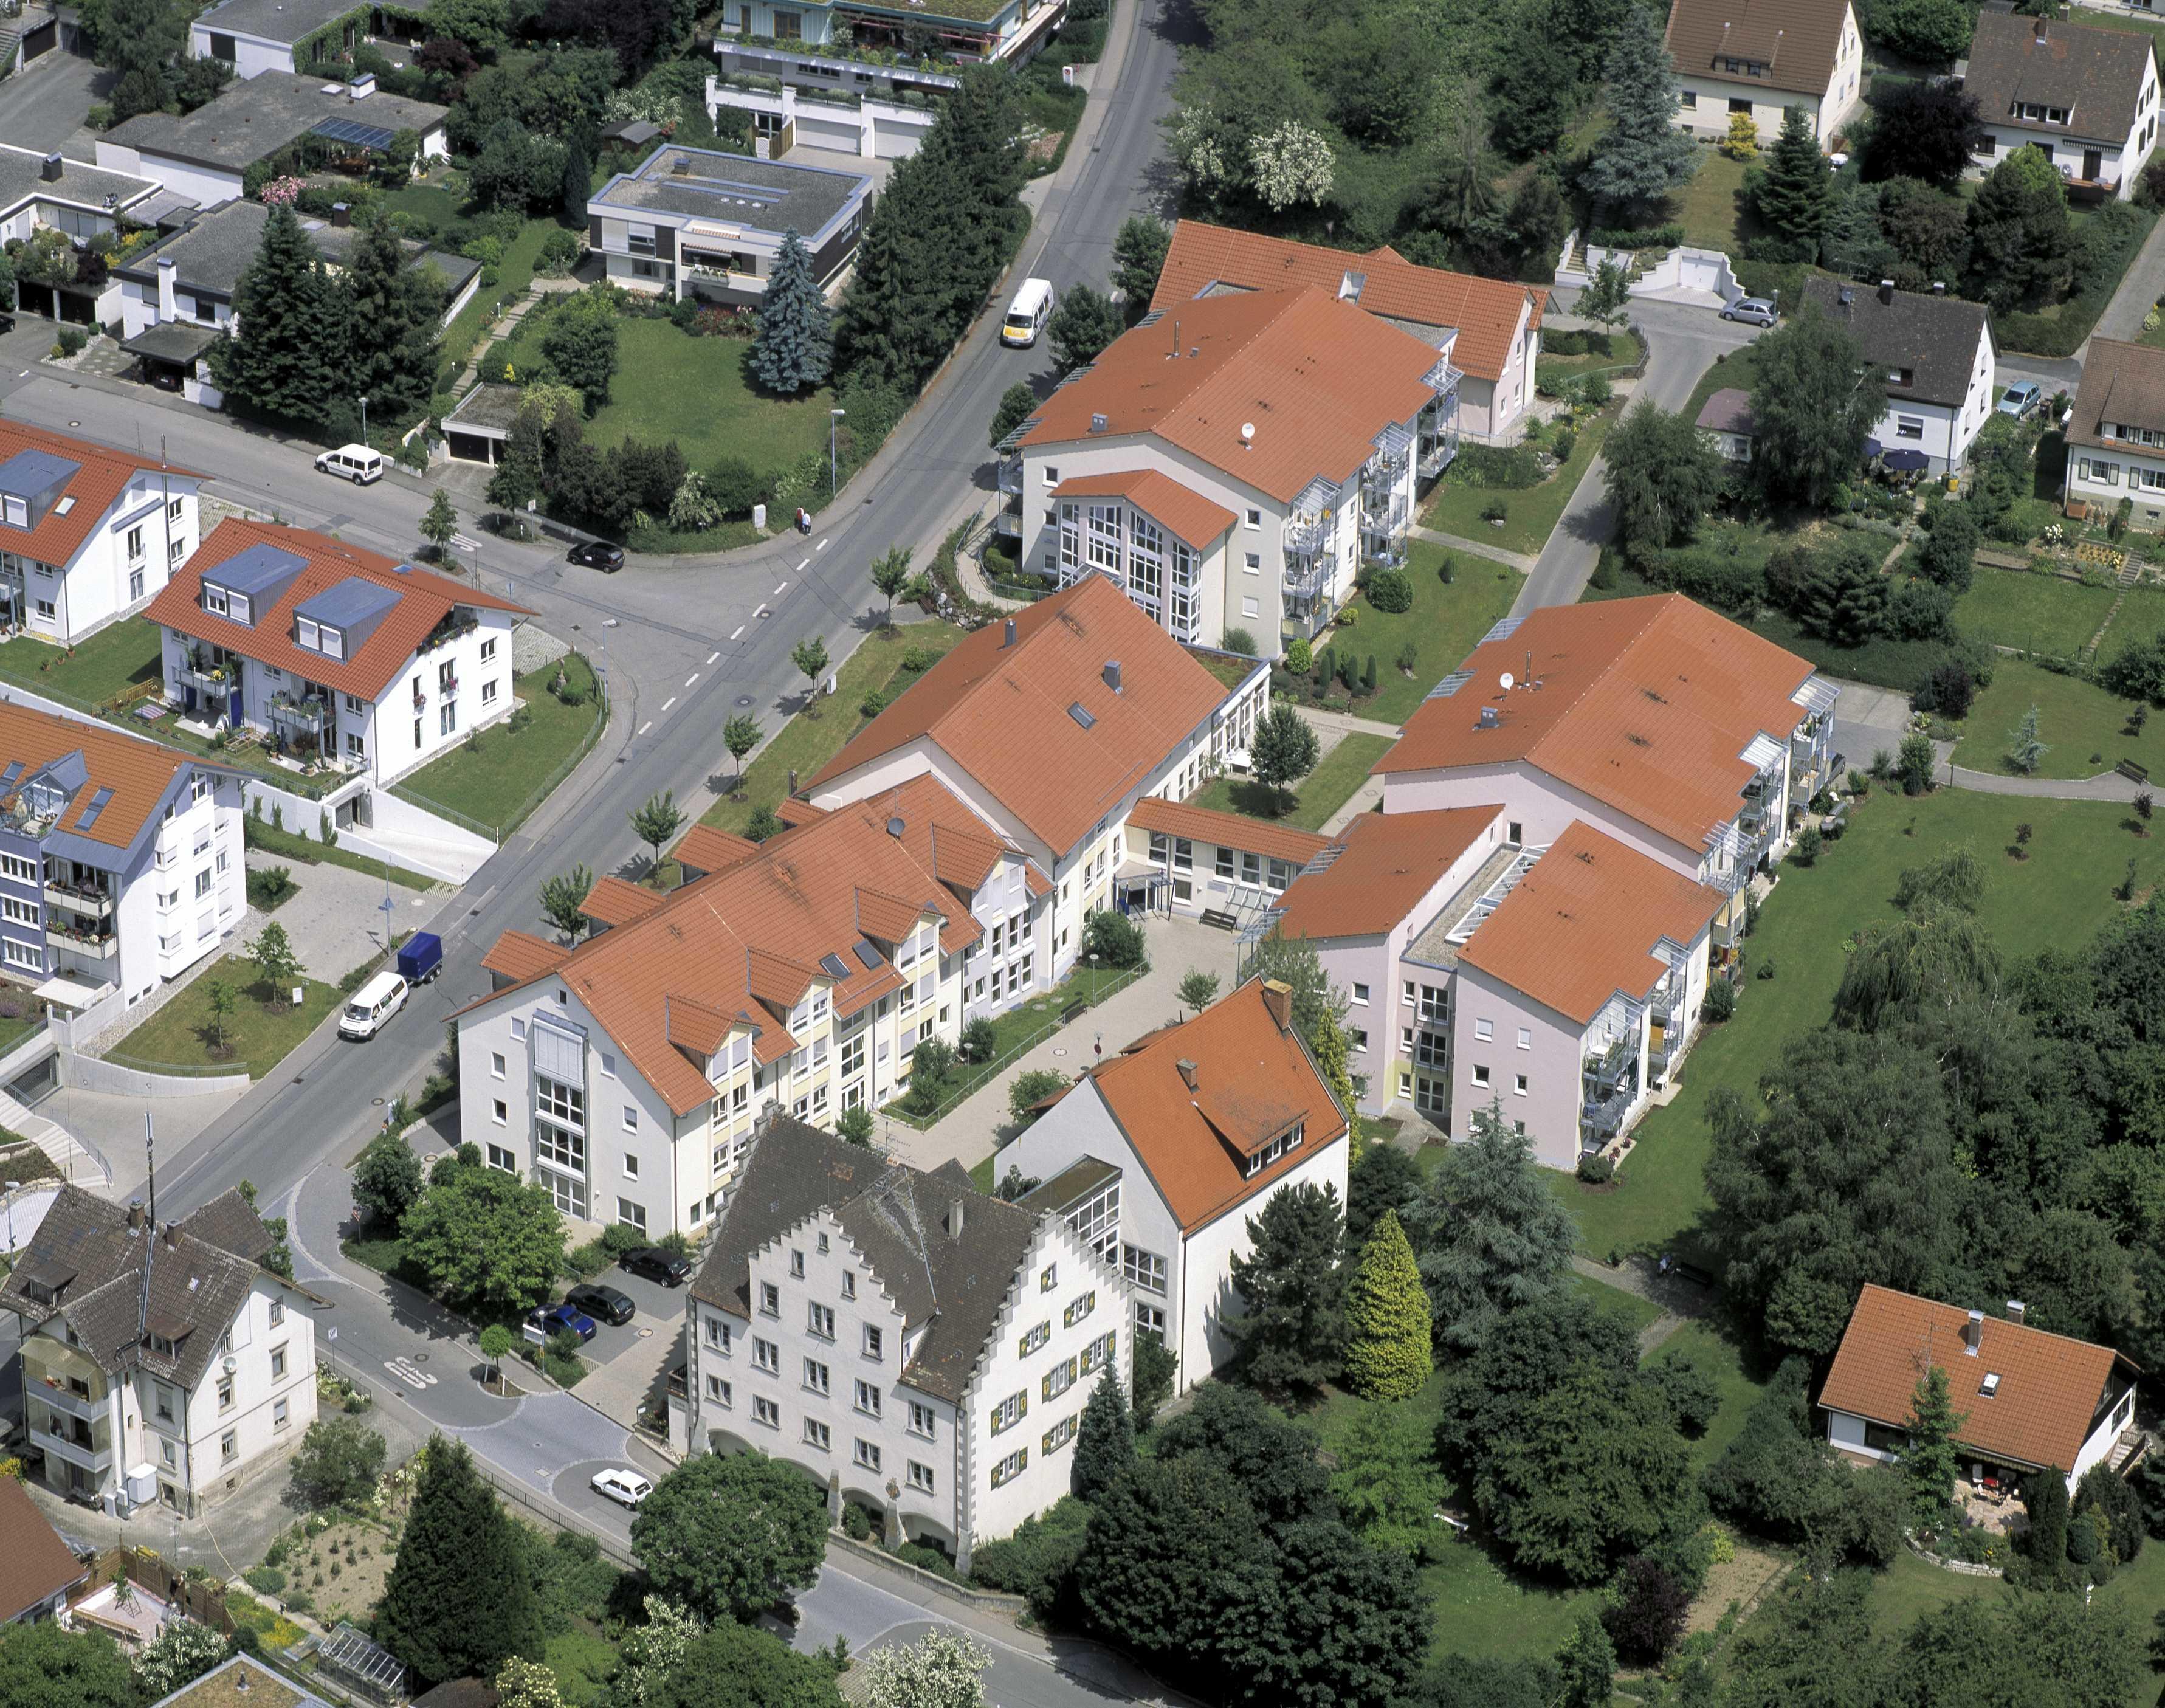 Seniorenzentrum St. Franziskus